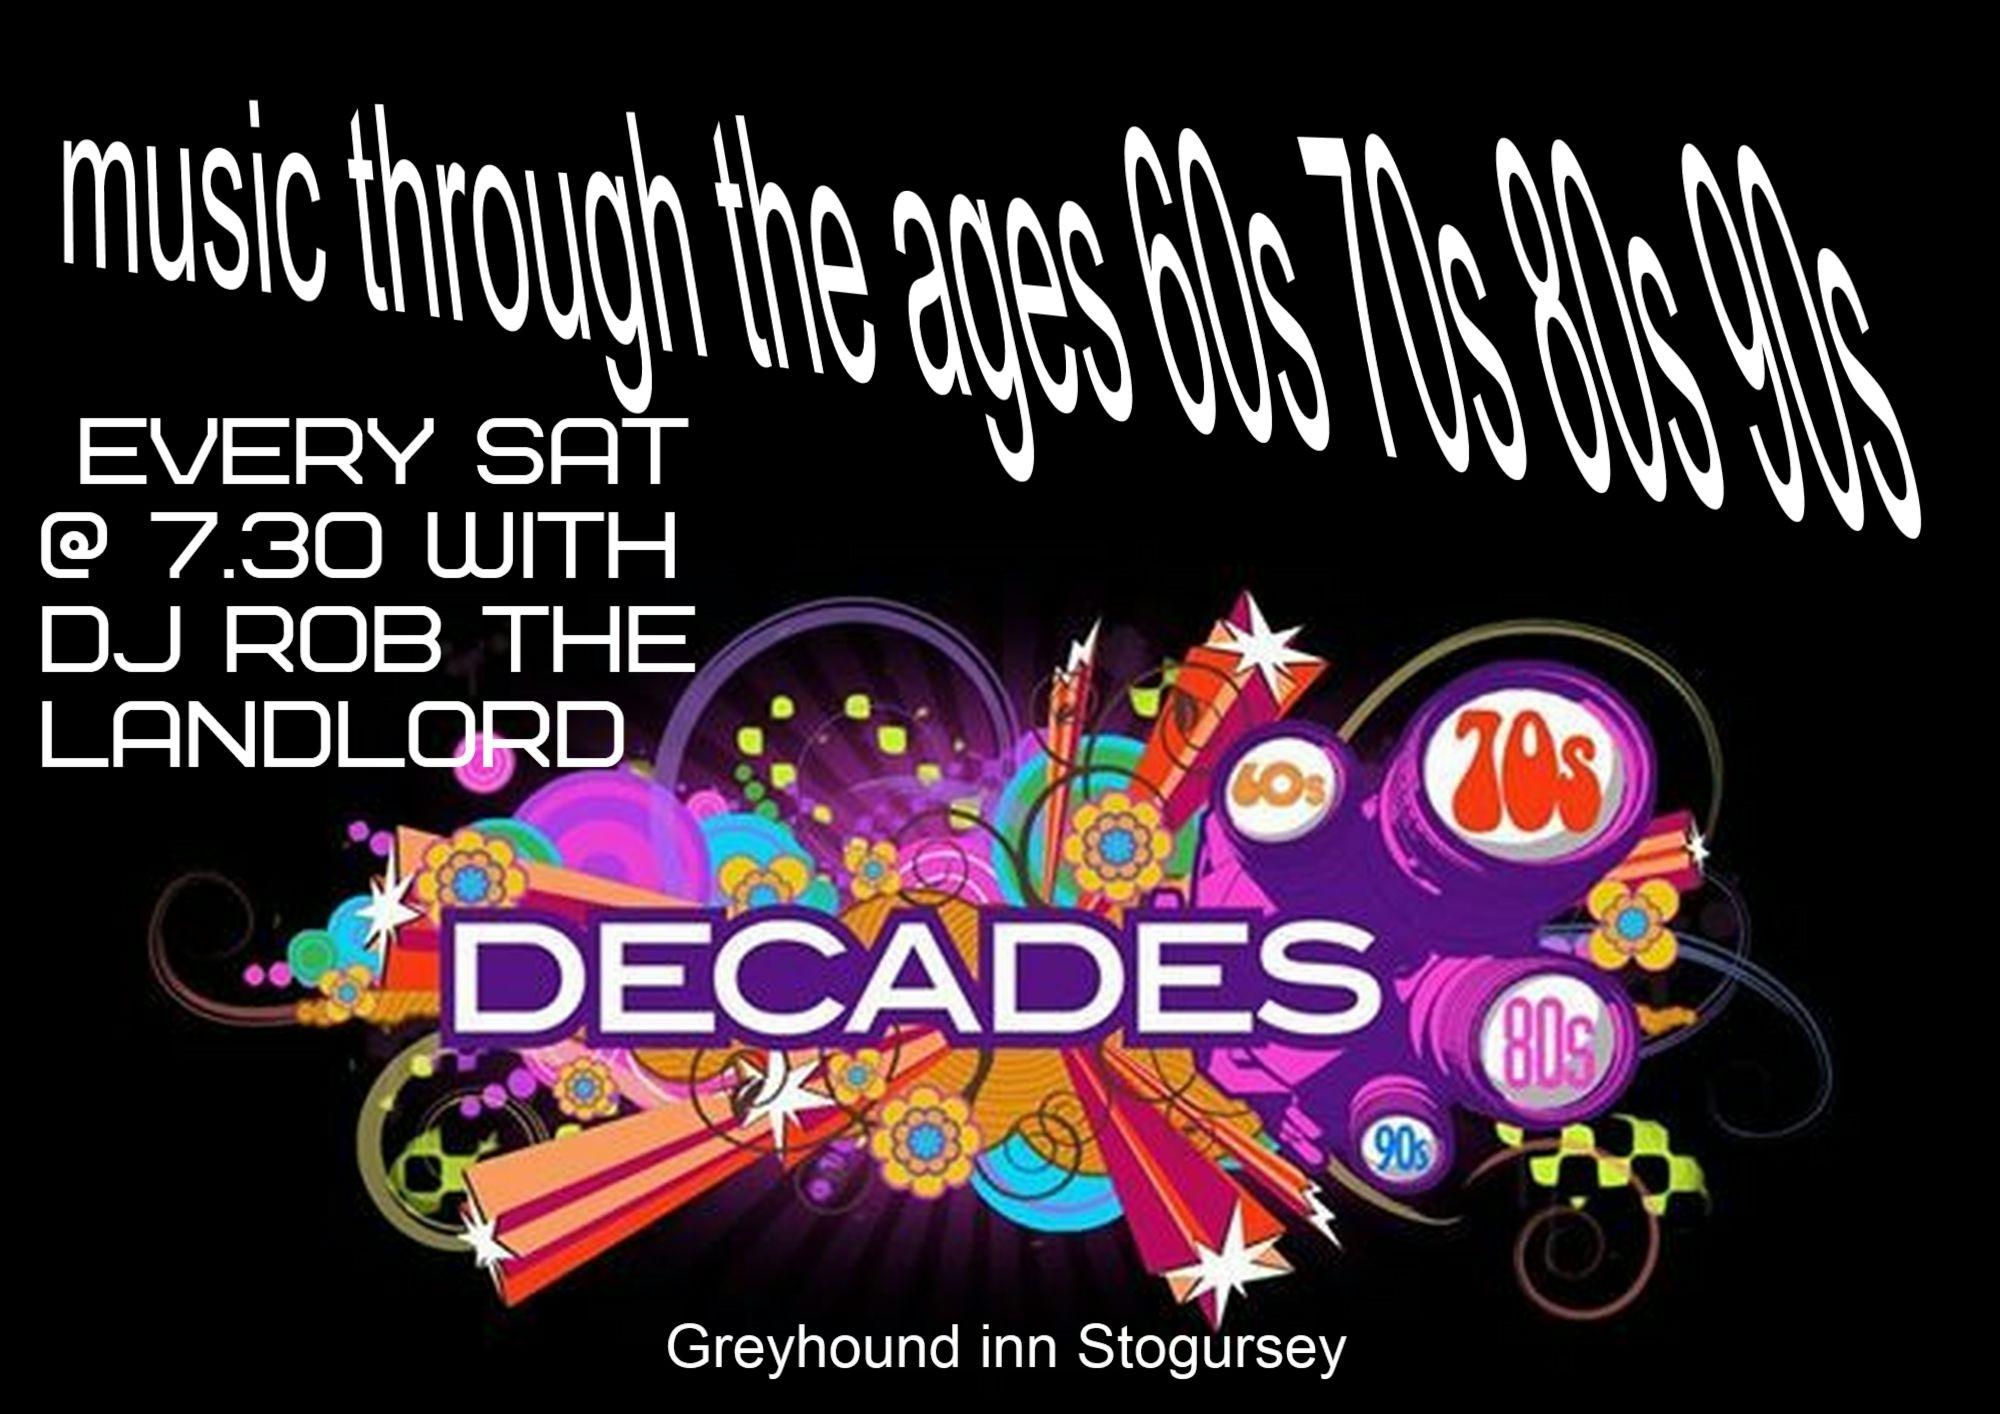 Decades music with DJ Rob